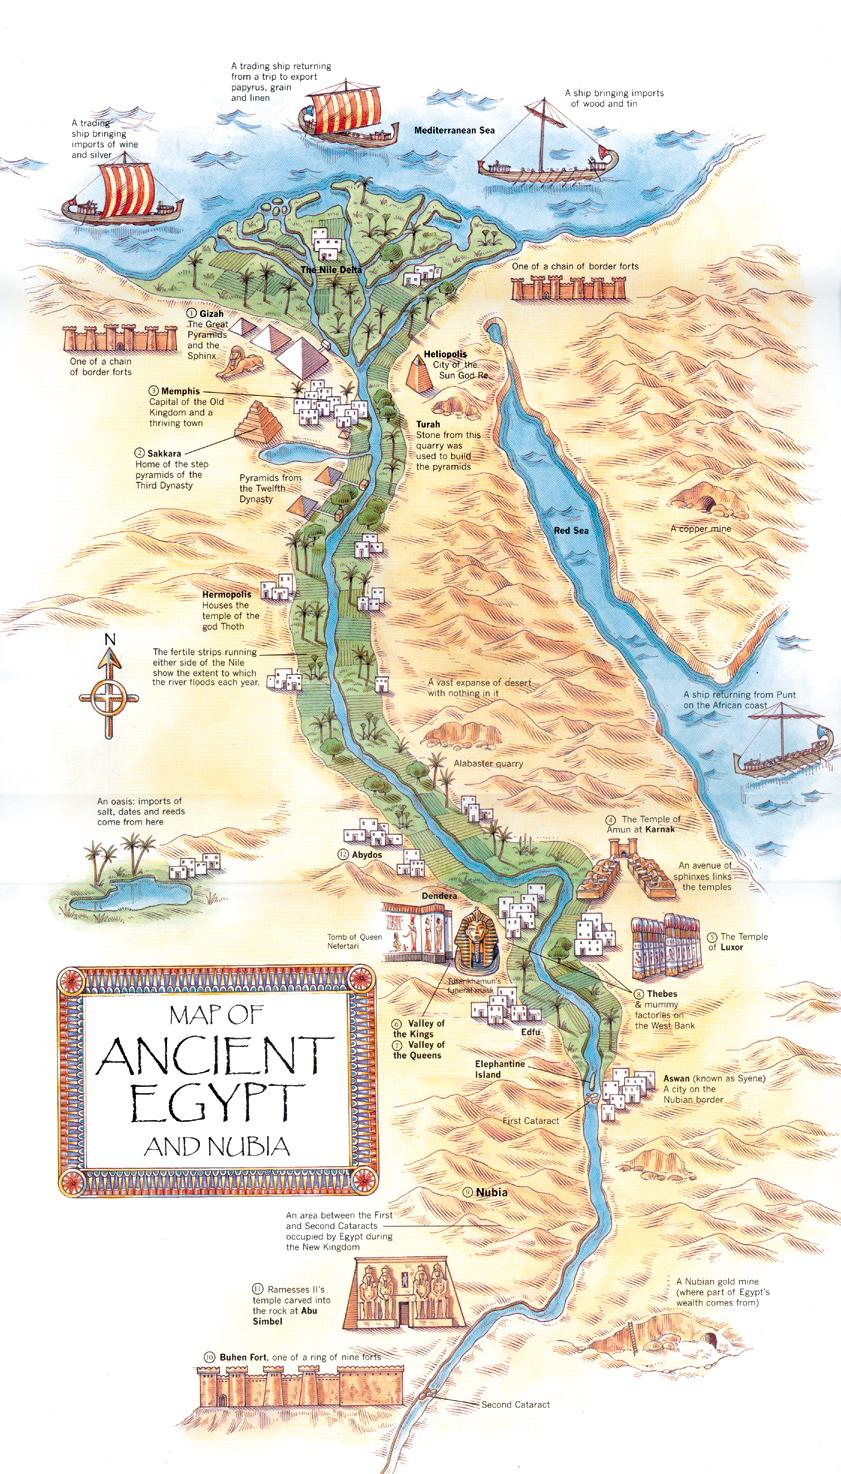 AncientEgyptMap jpg JPEG Image 841x1474 Pixels Pearltrees